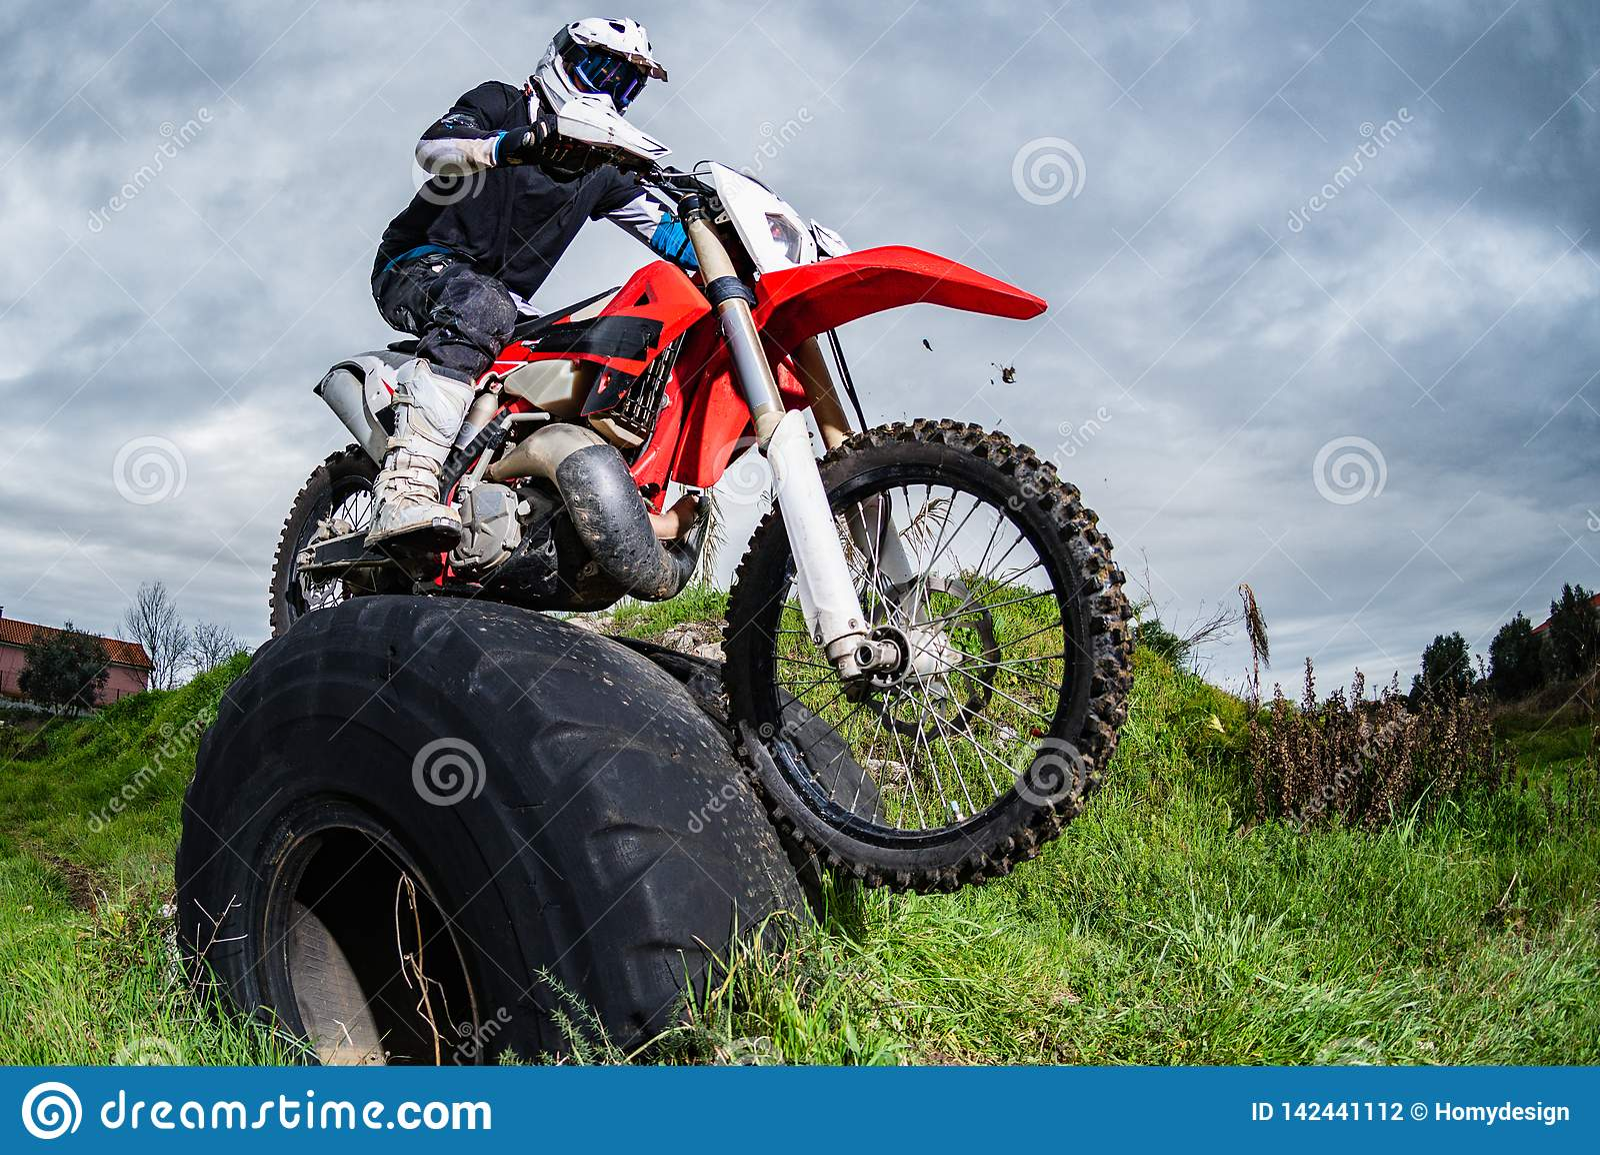 Enduro bike rider stock image. Image of freeride, dirt